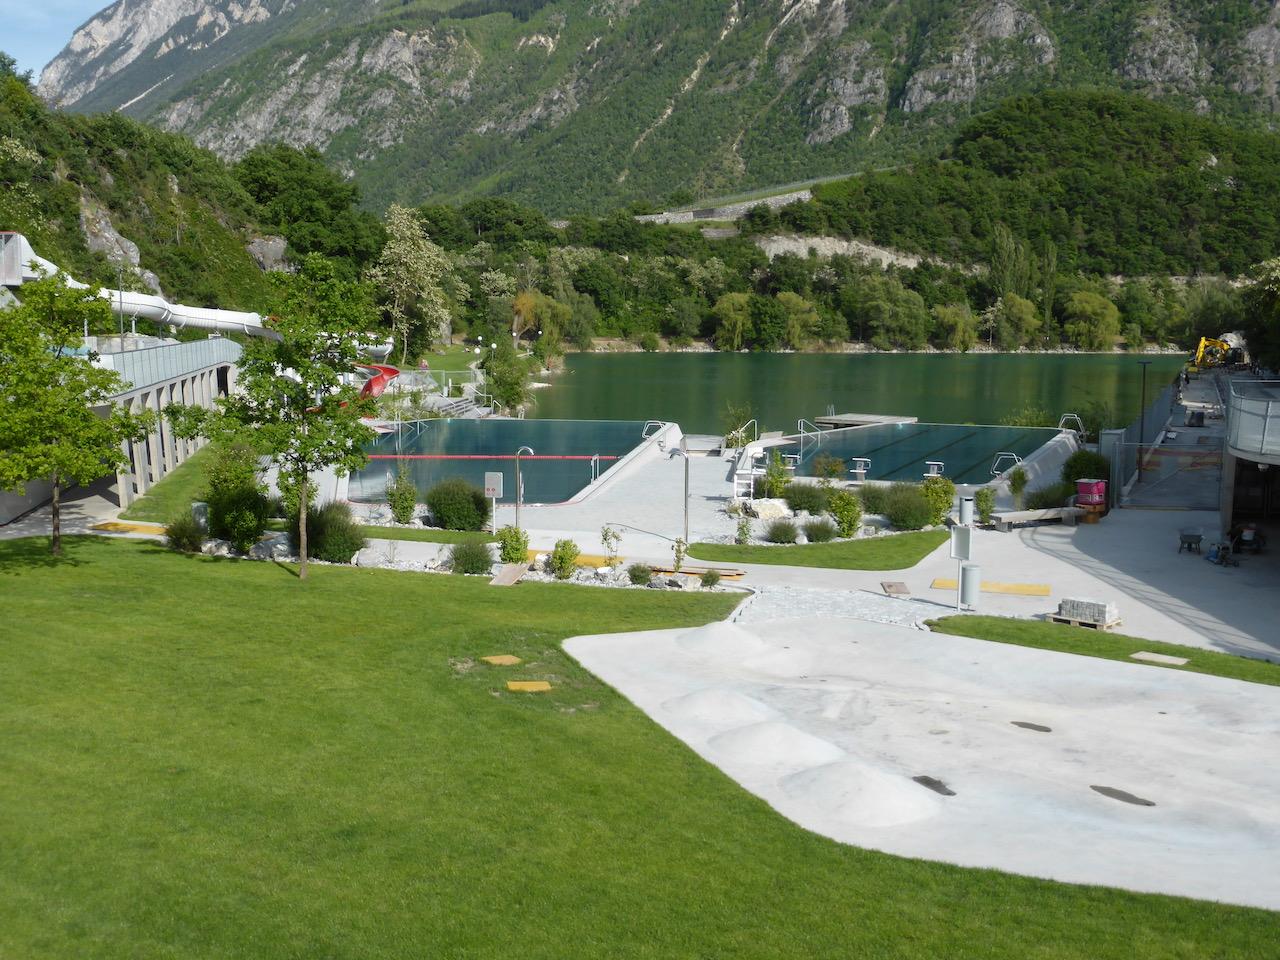 infinity pools & lake swimming at lac de geronde sierre